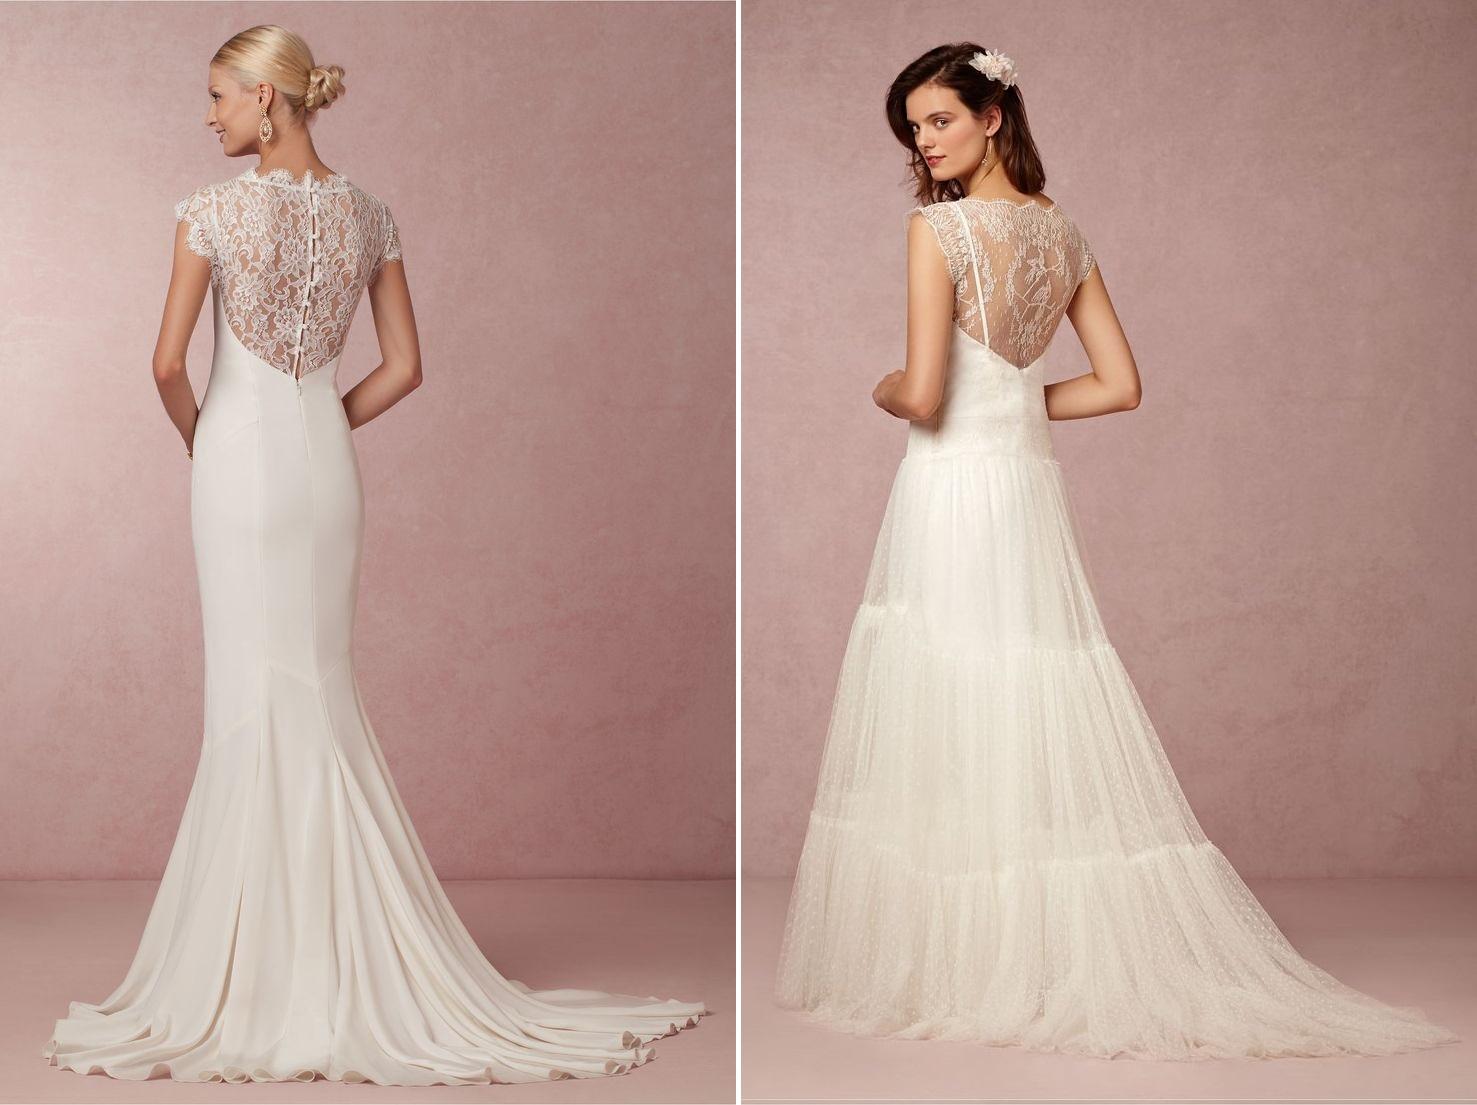 Lauren & Margot Wedding Dresses from BHLDNs Spring 2015 Bridal Collection